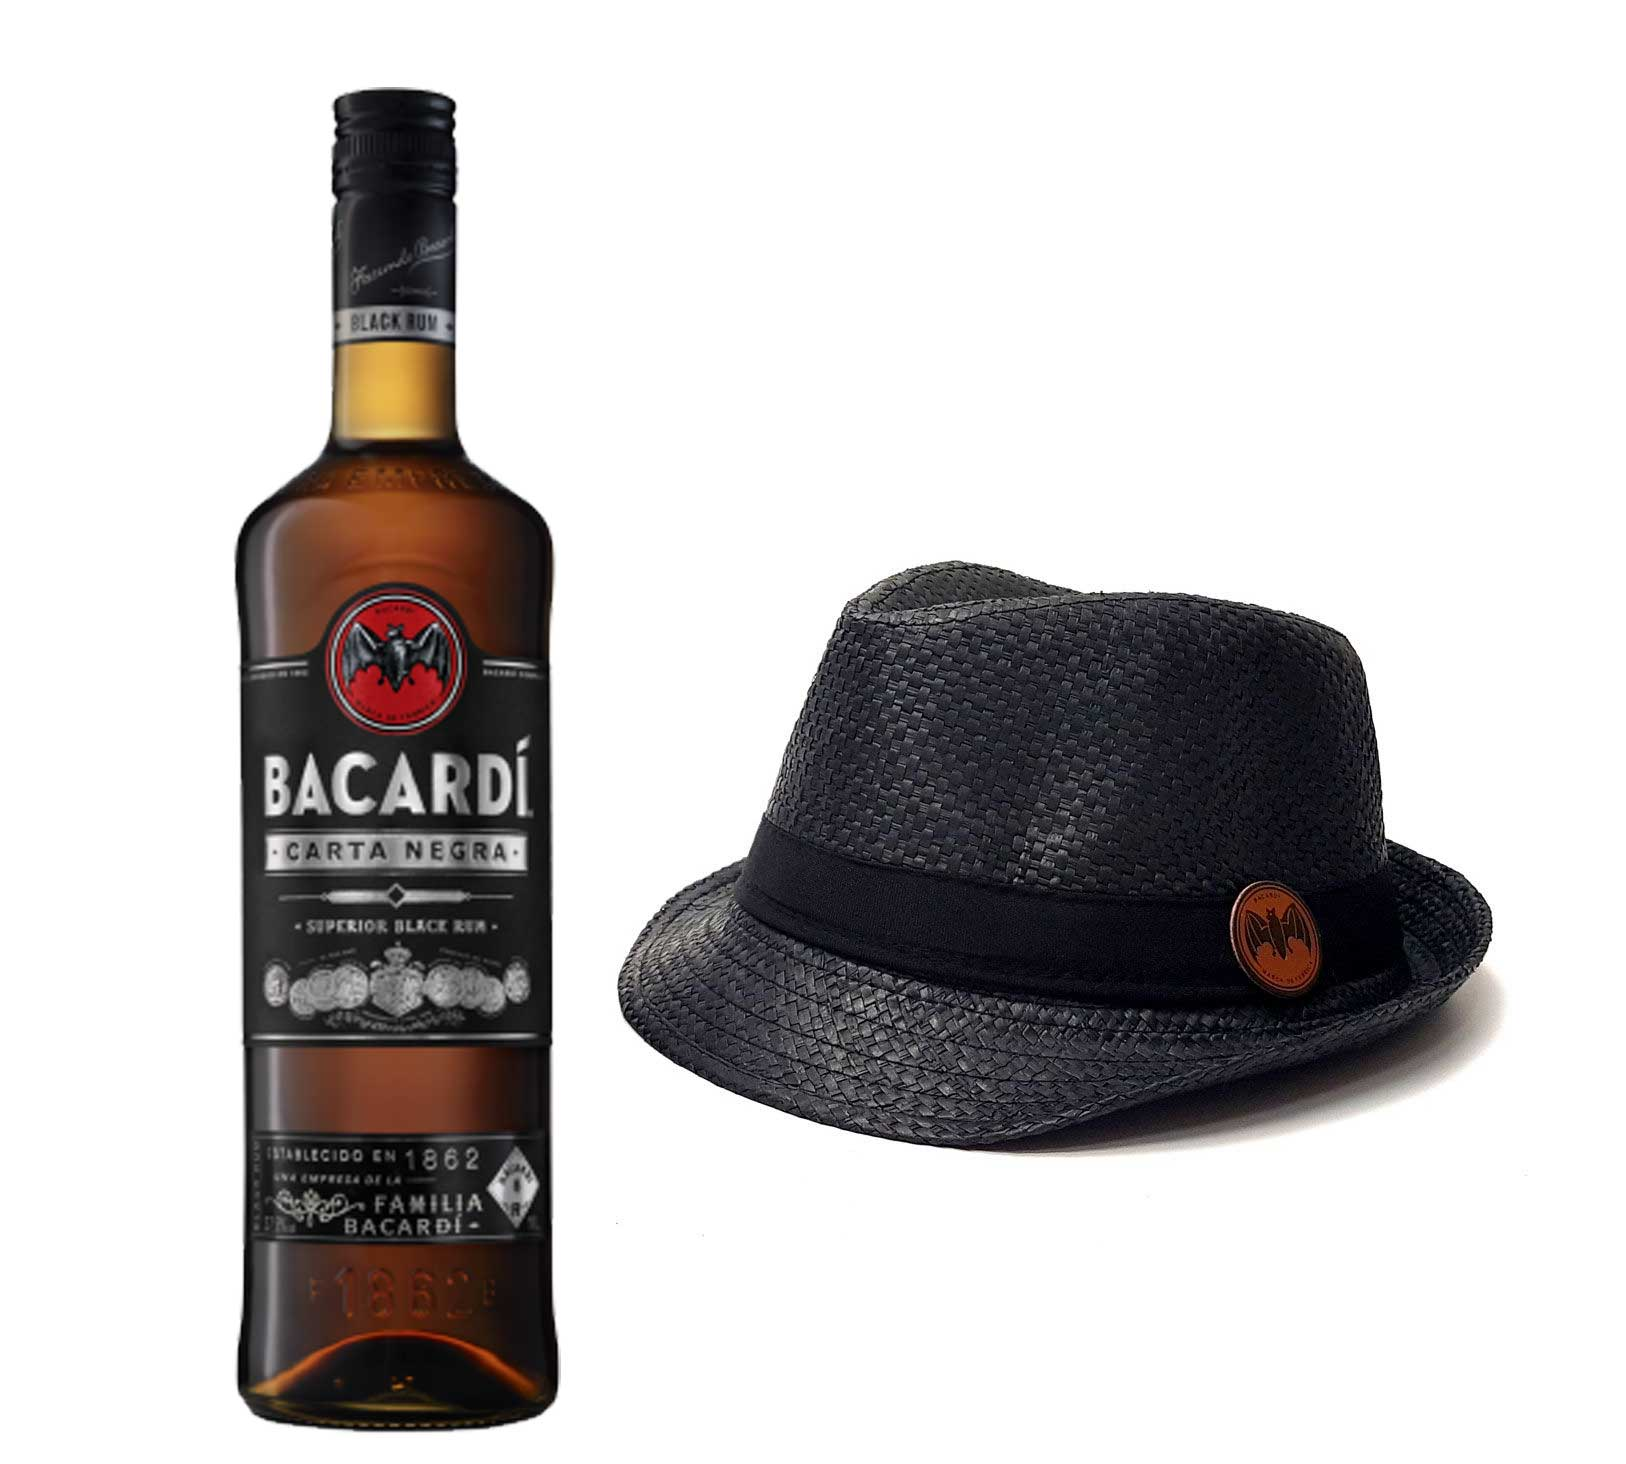 Bacardi Carta Negra Rum 1L (40% Vol) + Strohhut schwarz